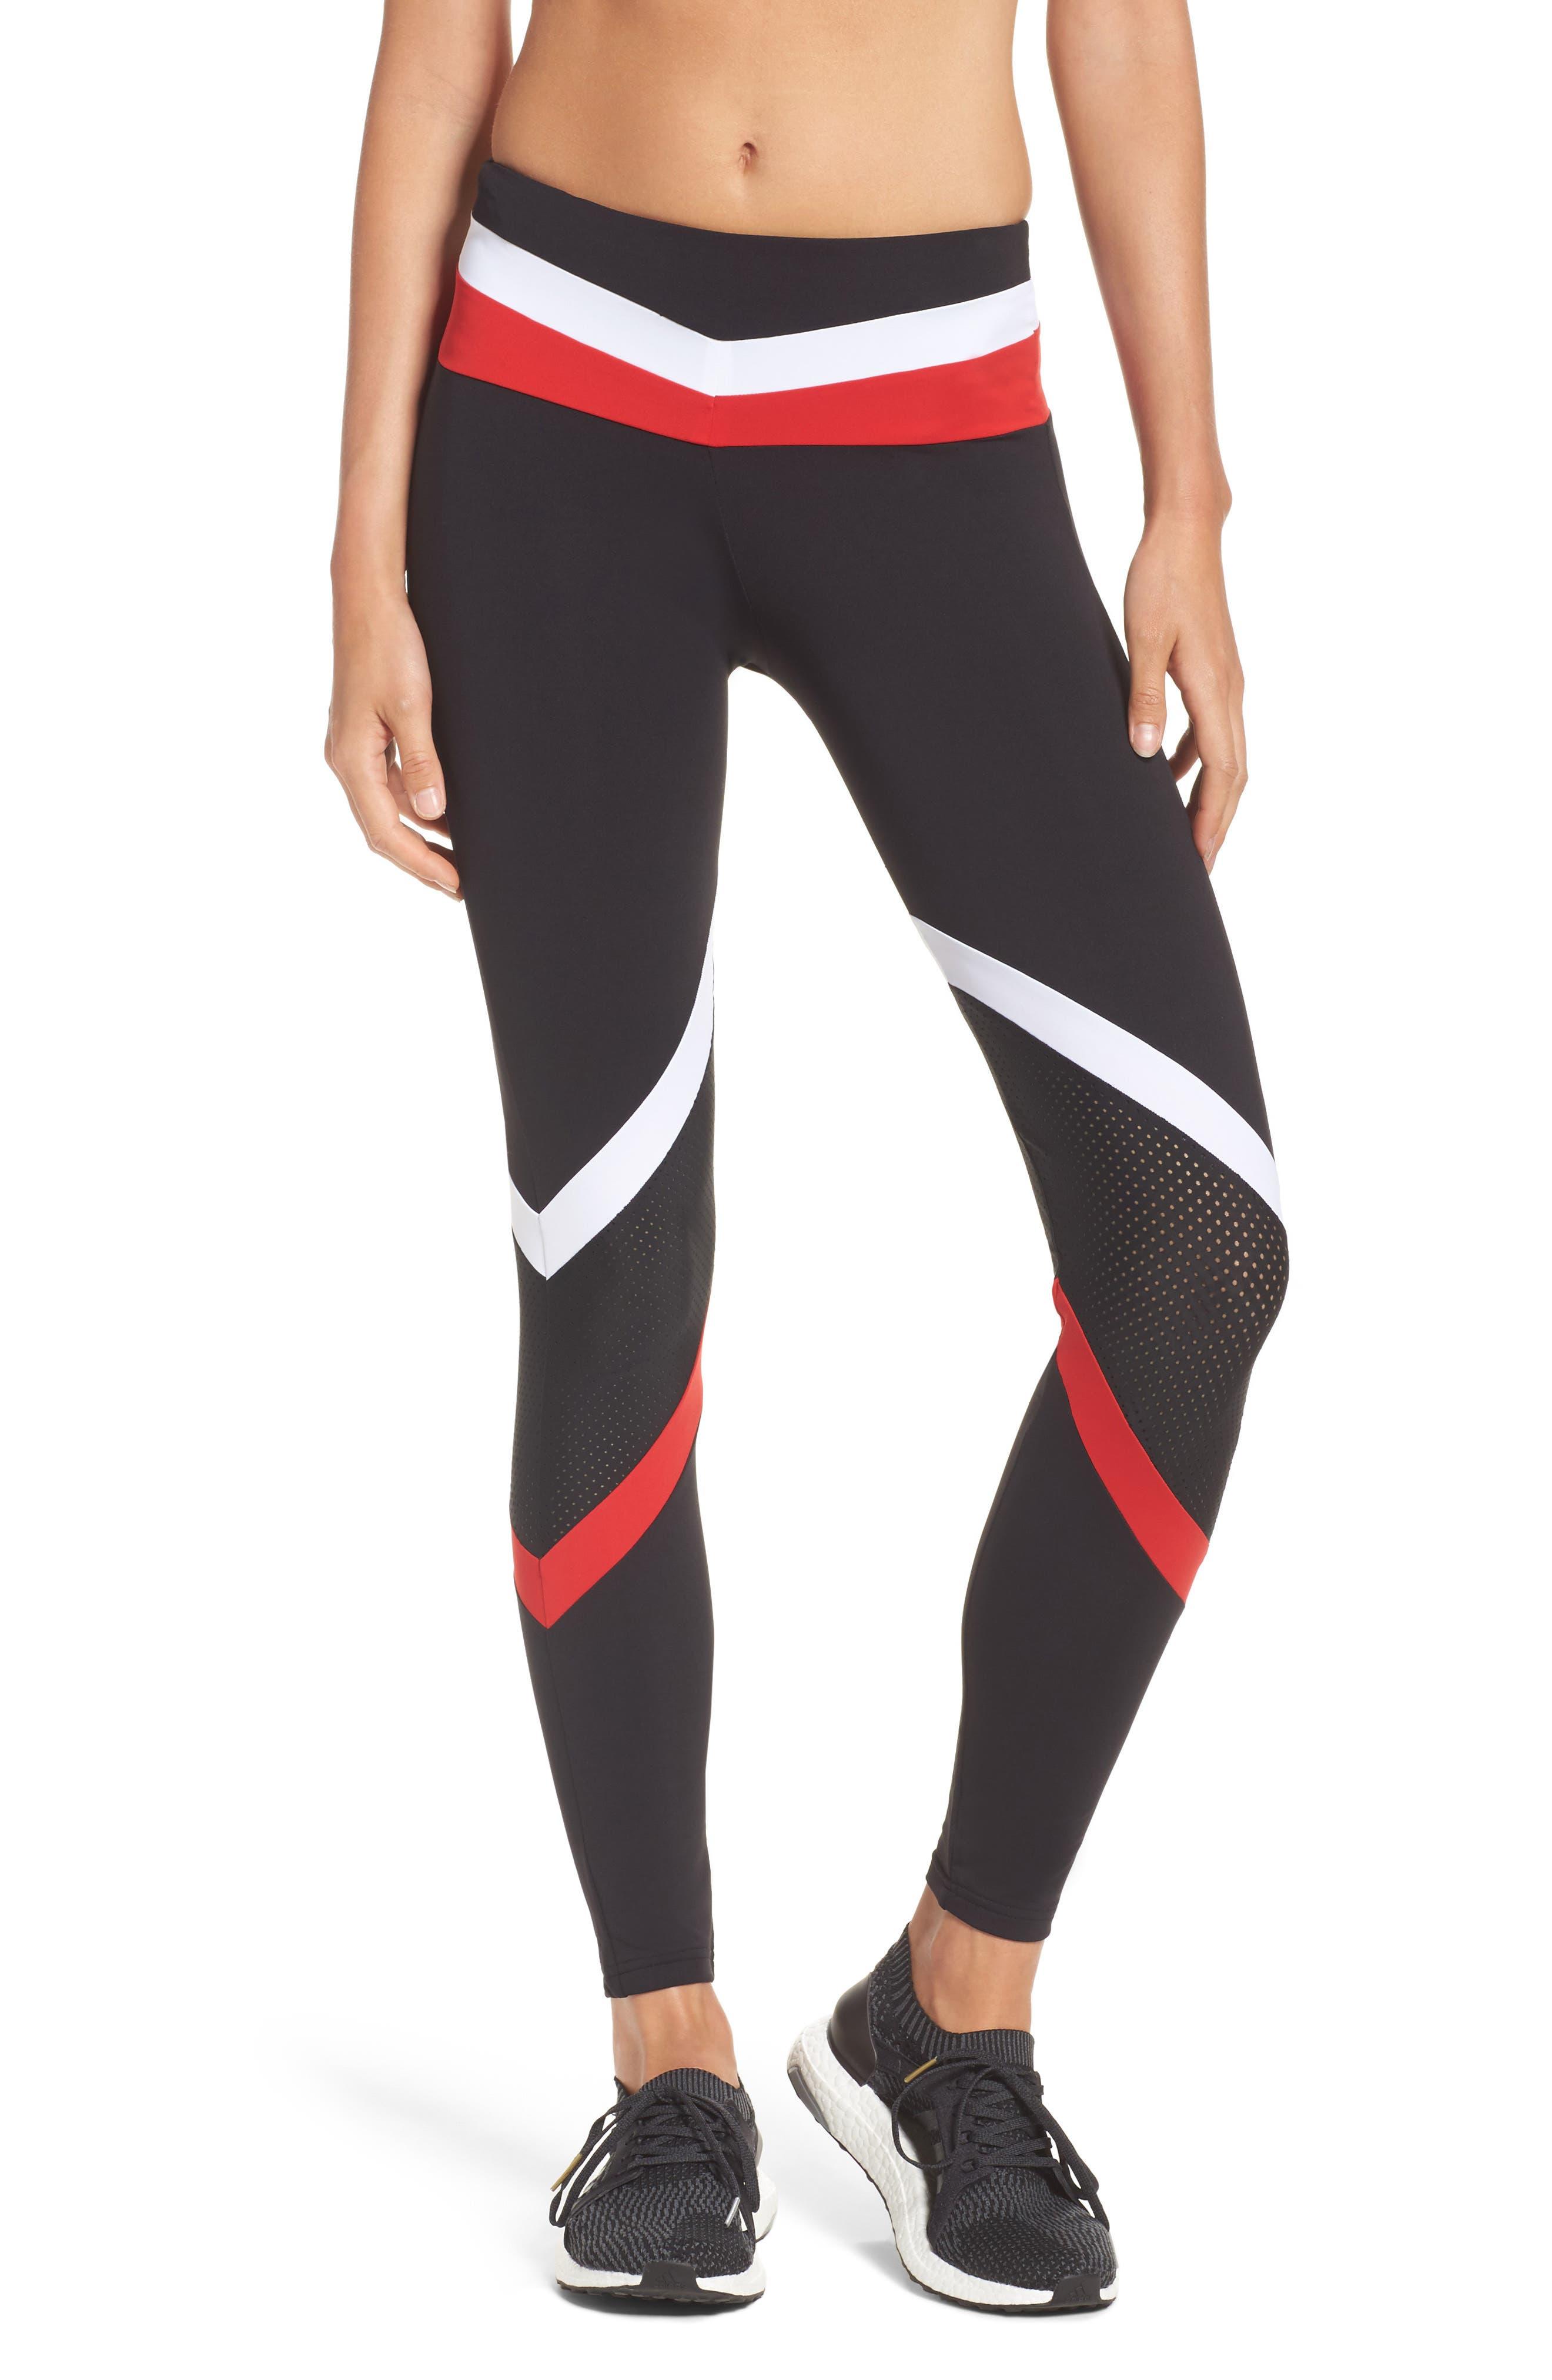 BoomBoom Athletica Leggings,                         Main,                         color, Black/ White/ Red